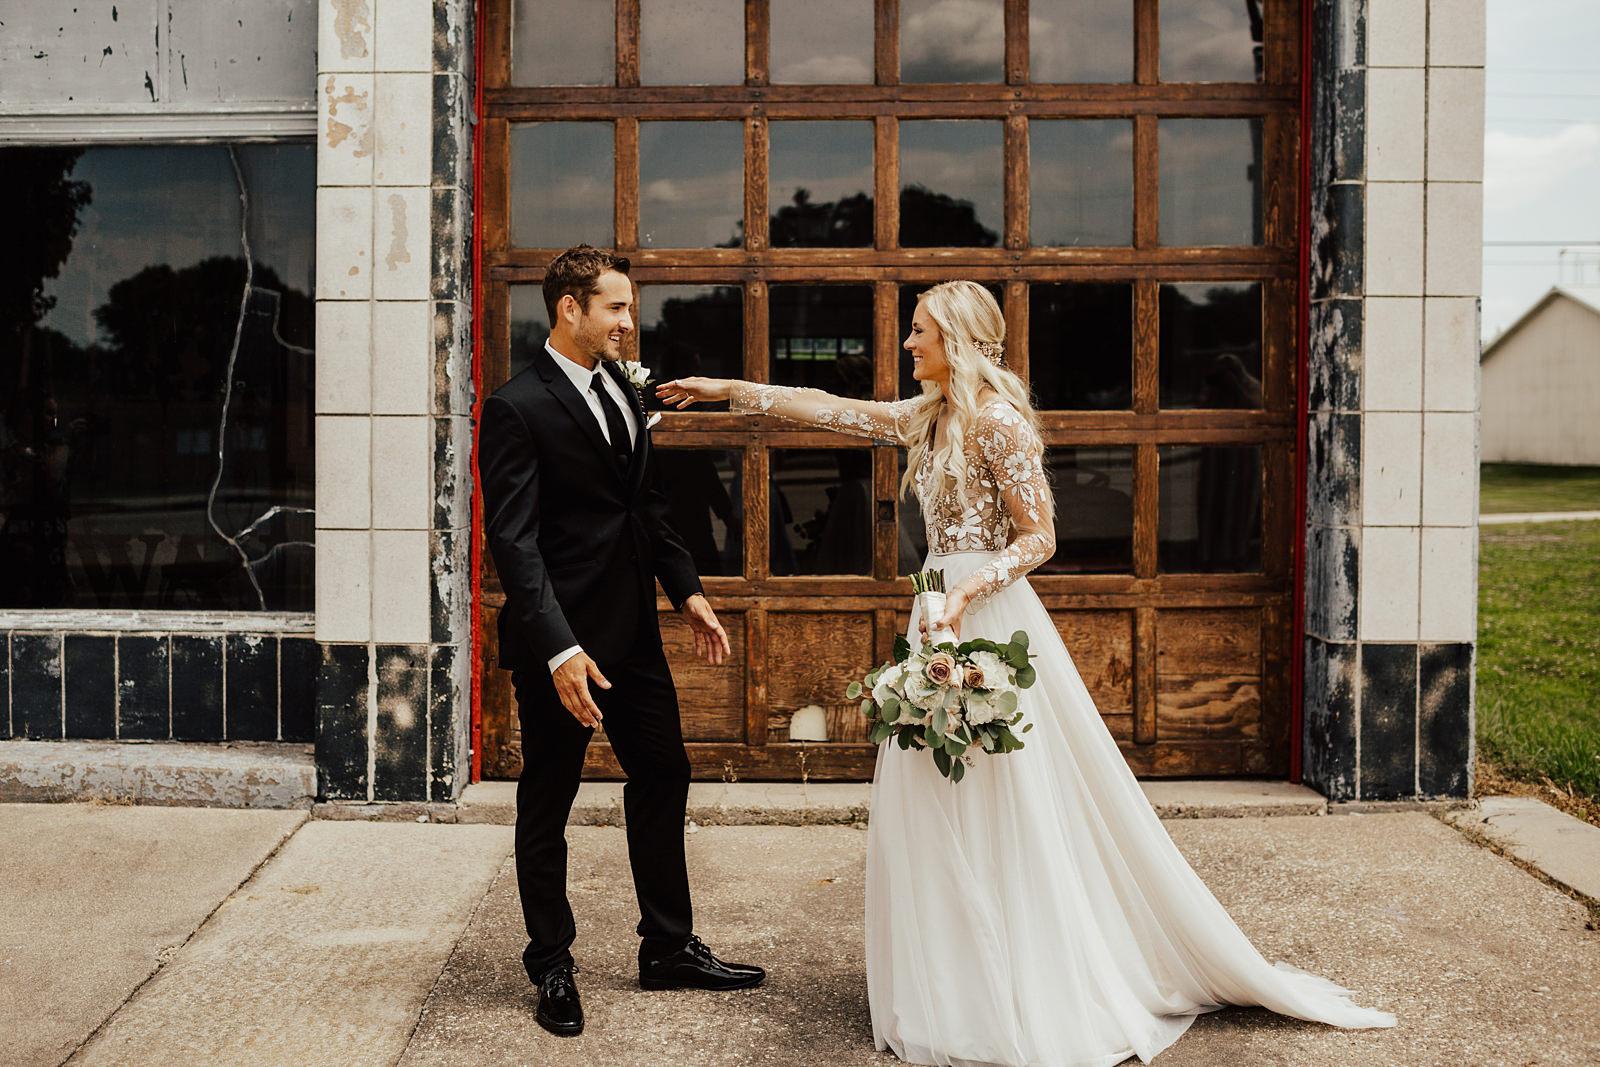 Molly & Bradley Modern Boho Wedding at The University Club Quad Cities-11.jpg